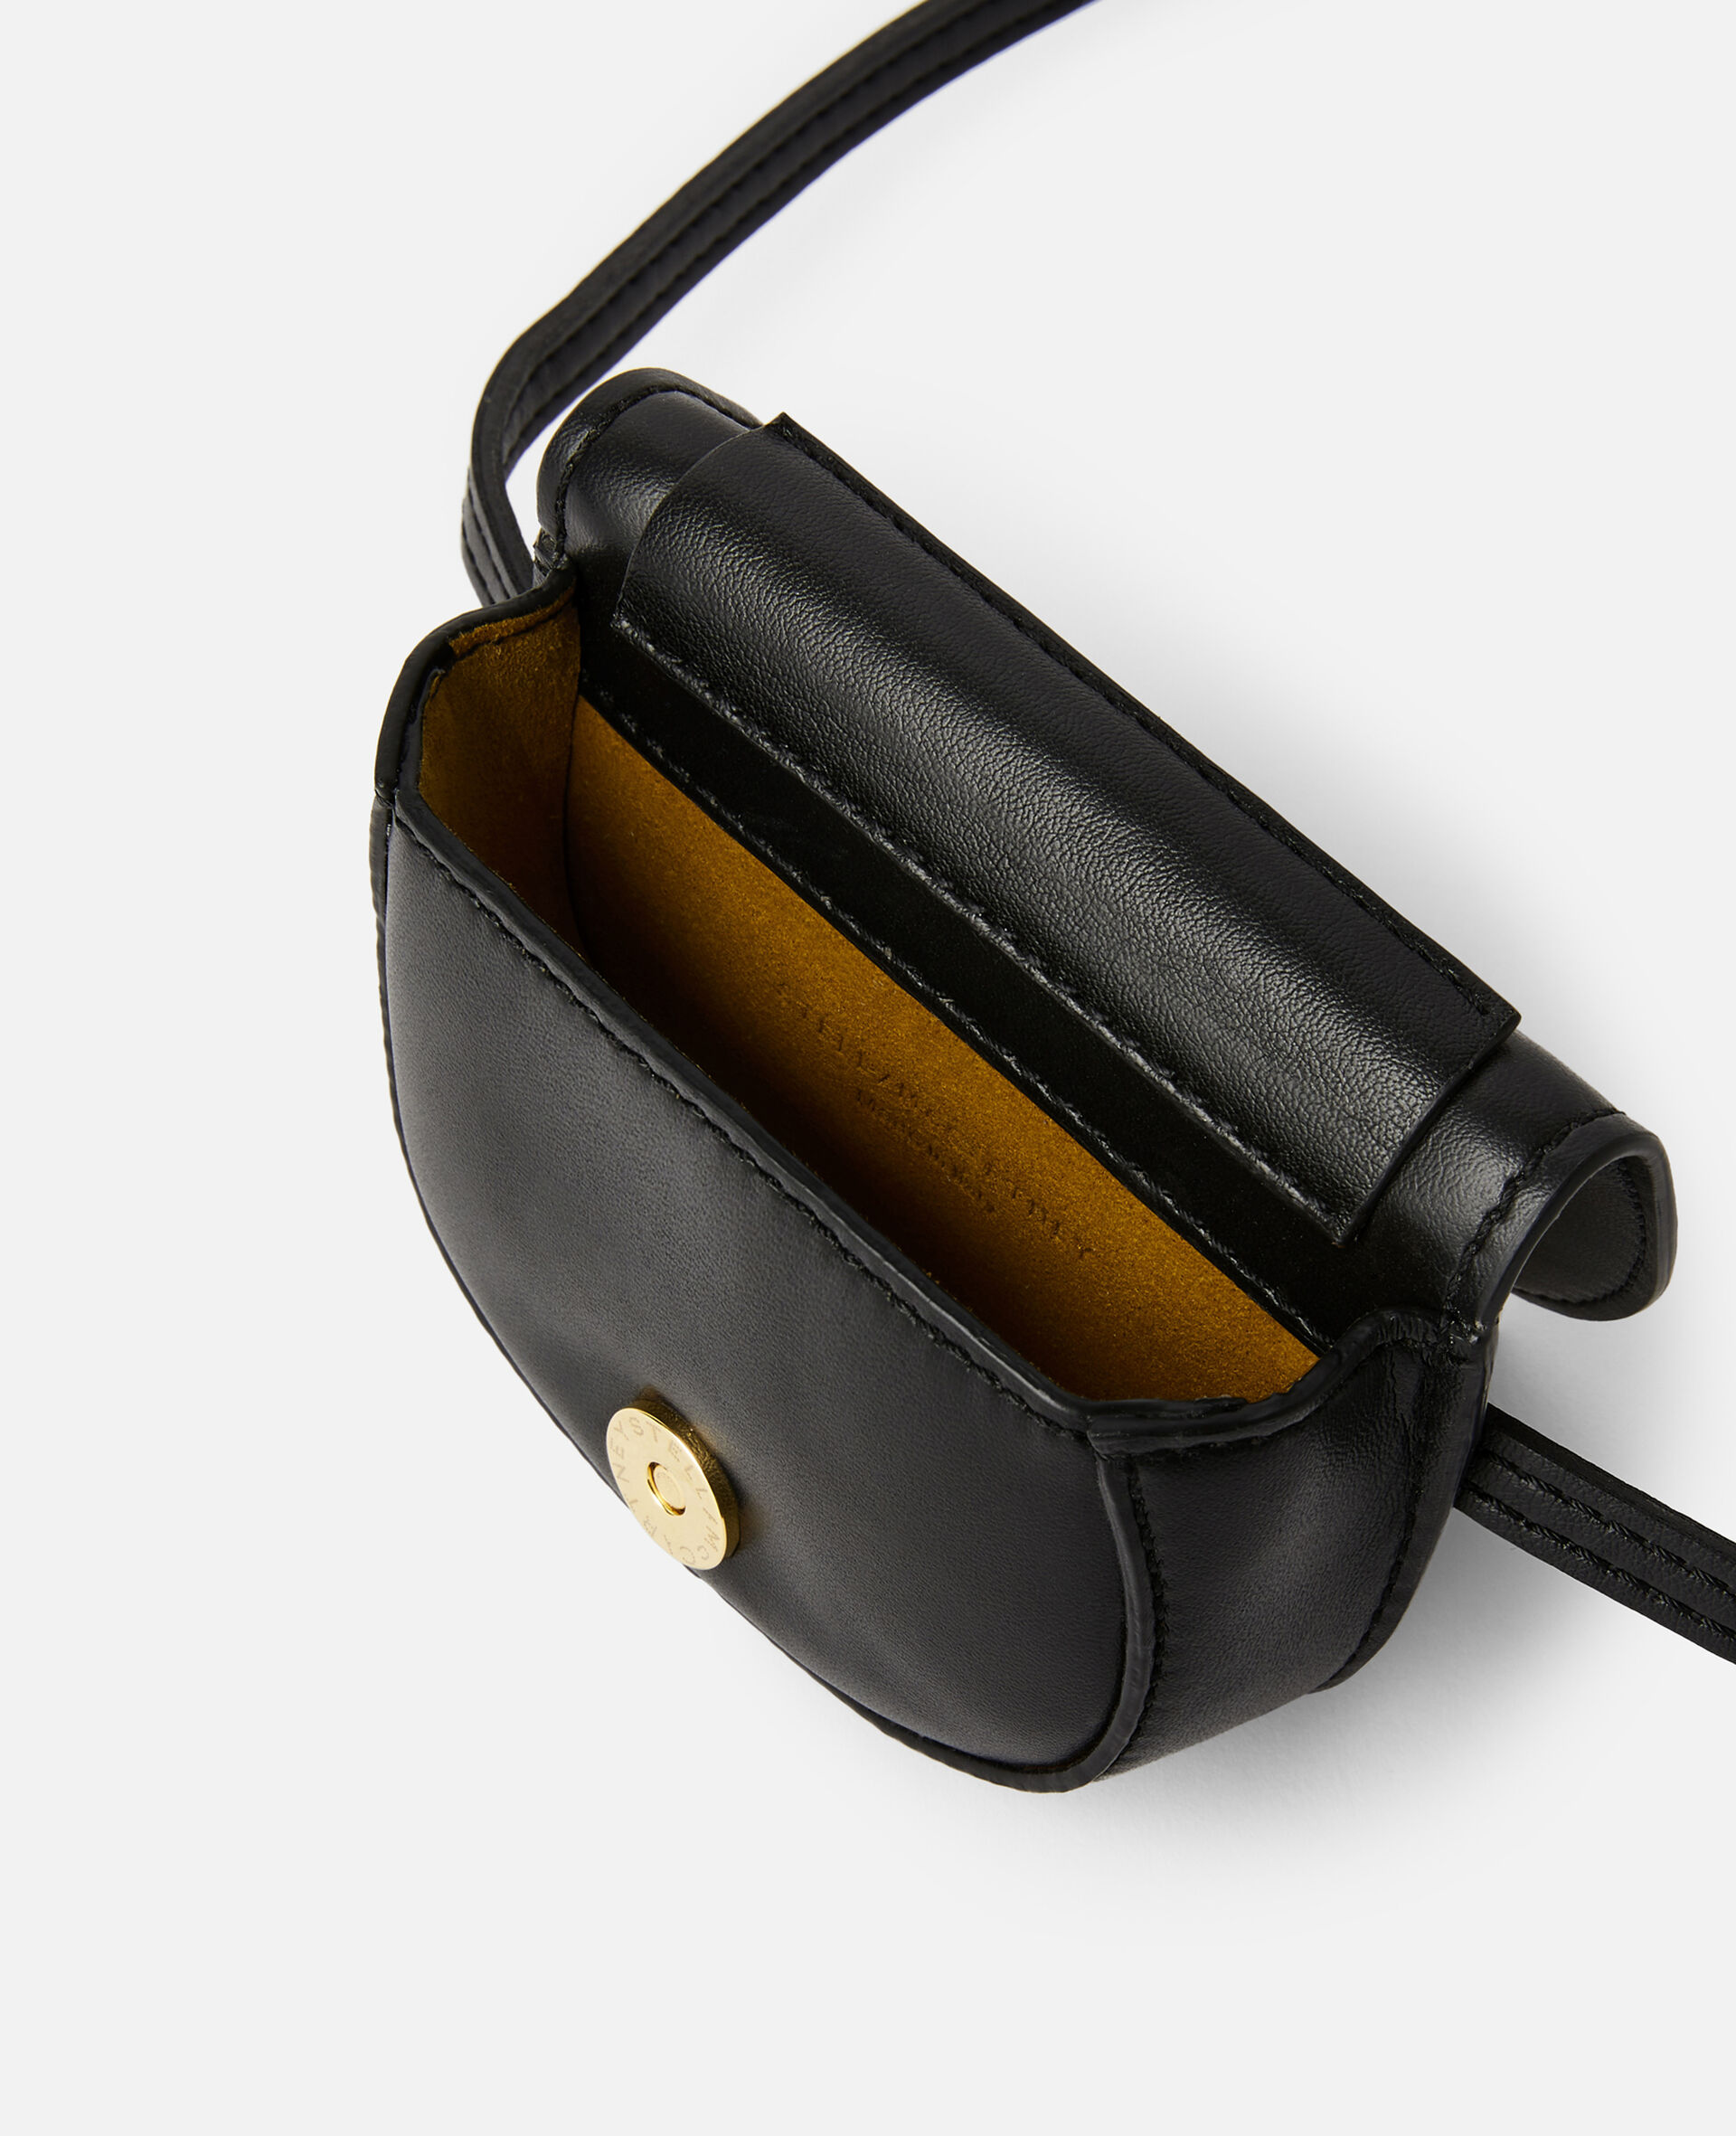 Sac ceinture Marlee miniature-Noir-large image number 3